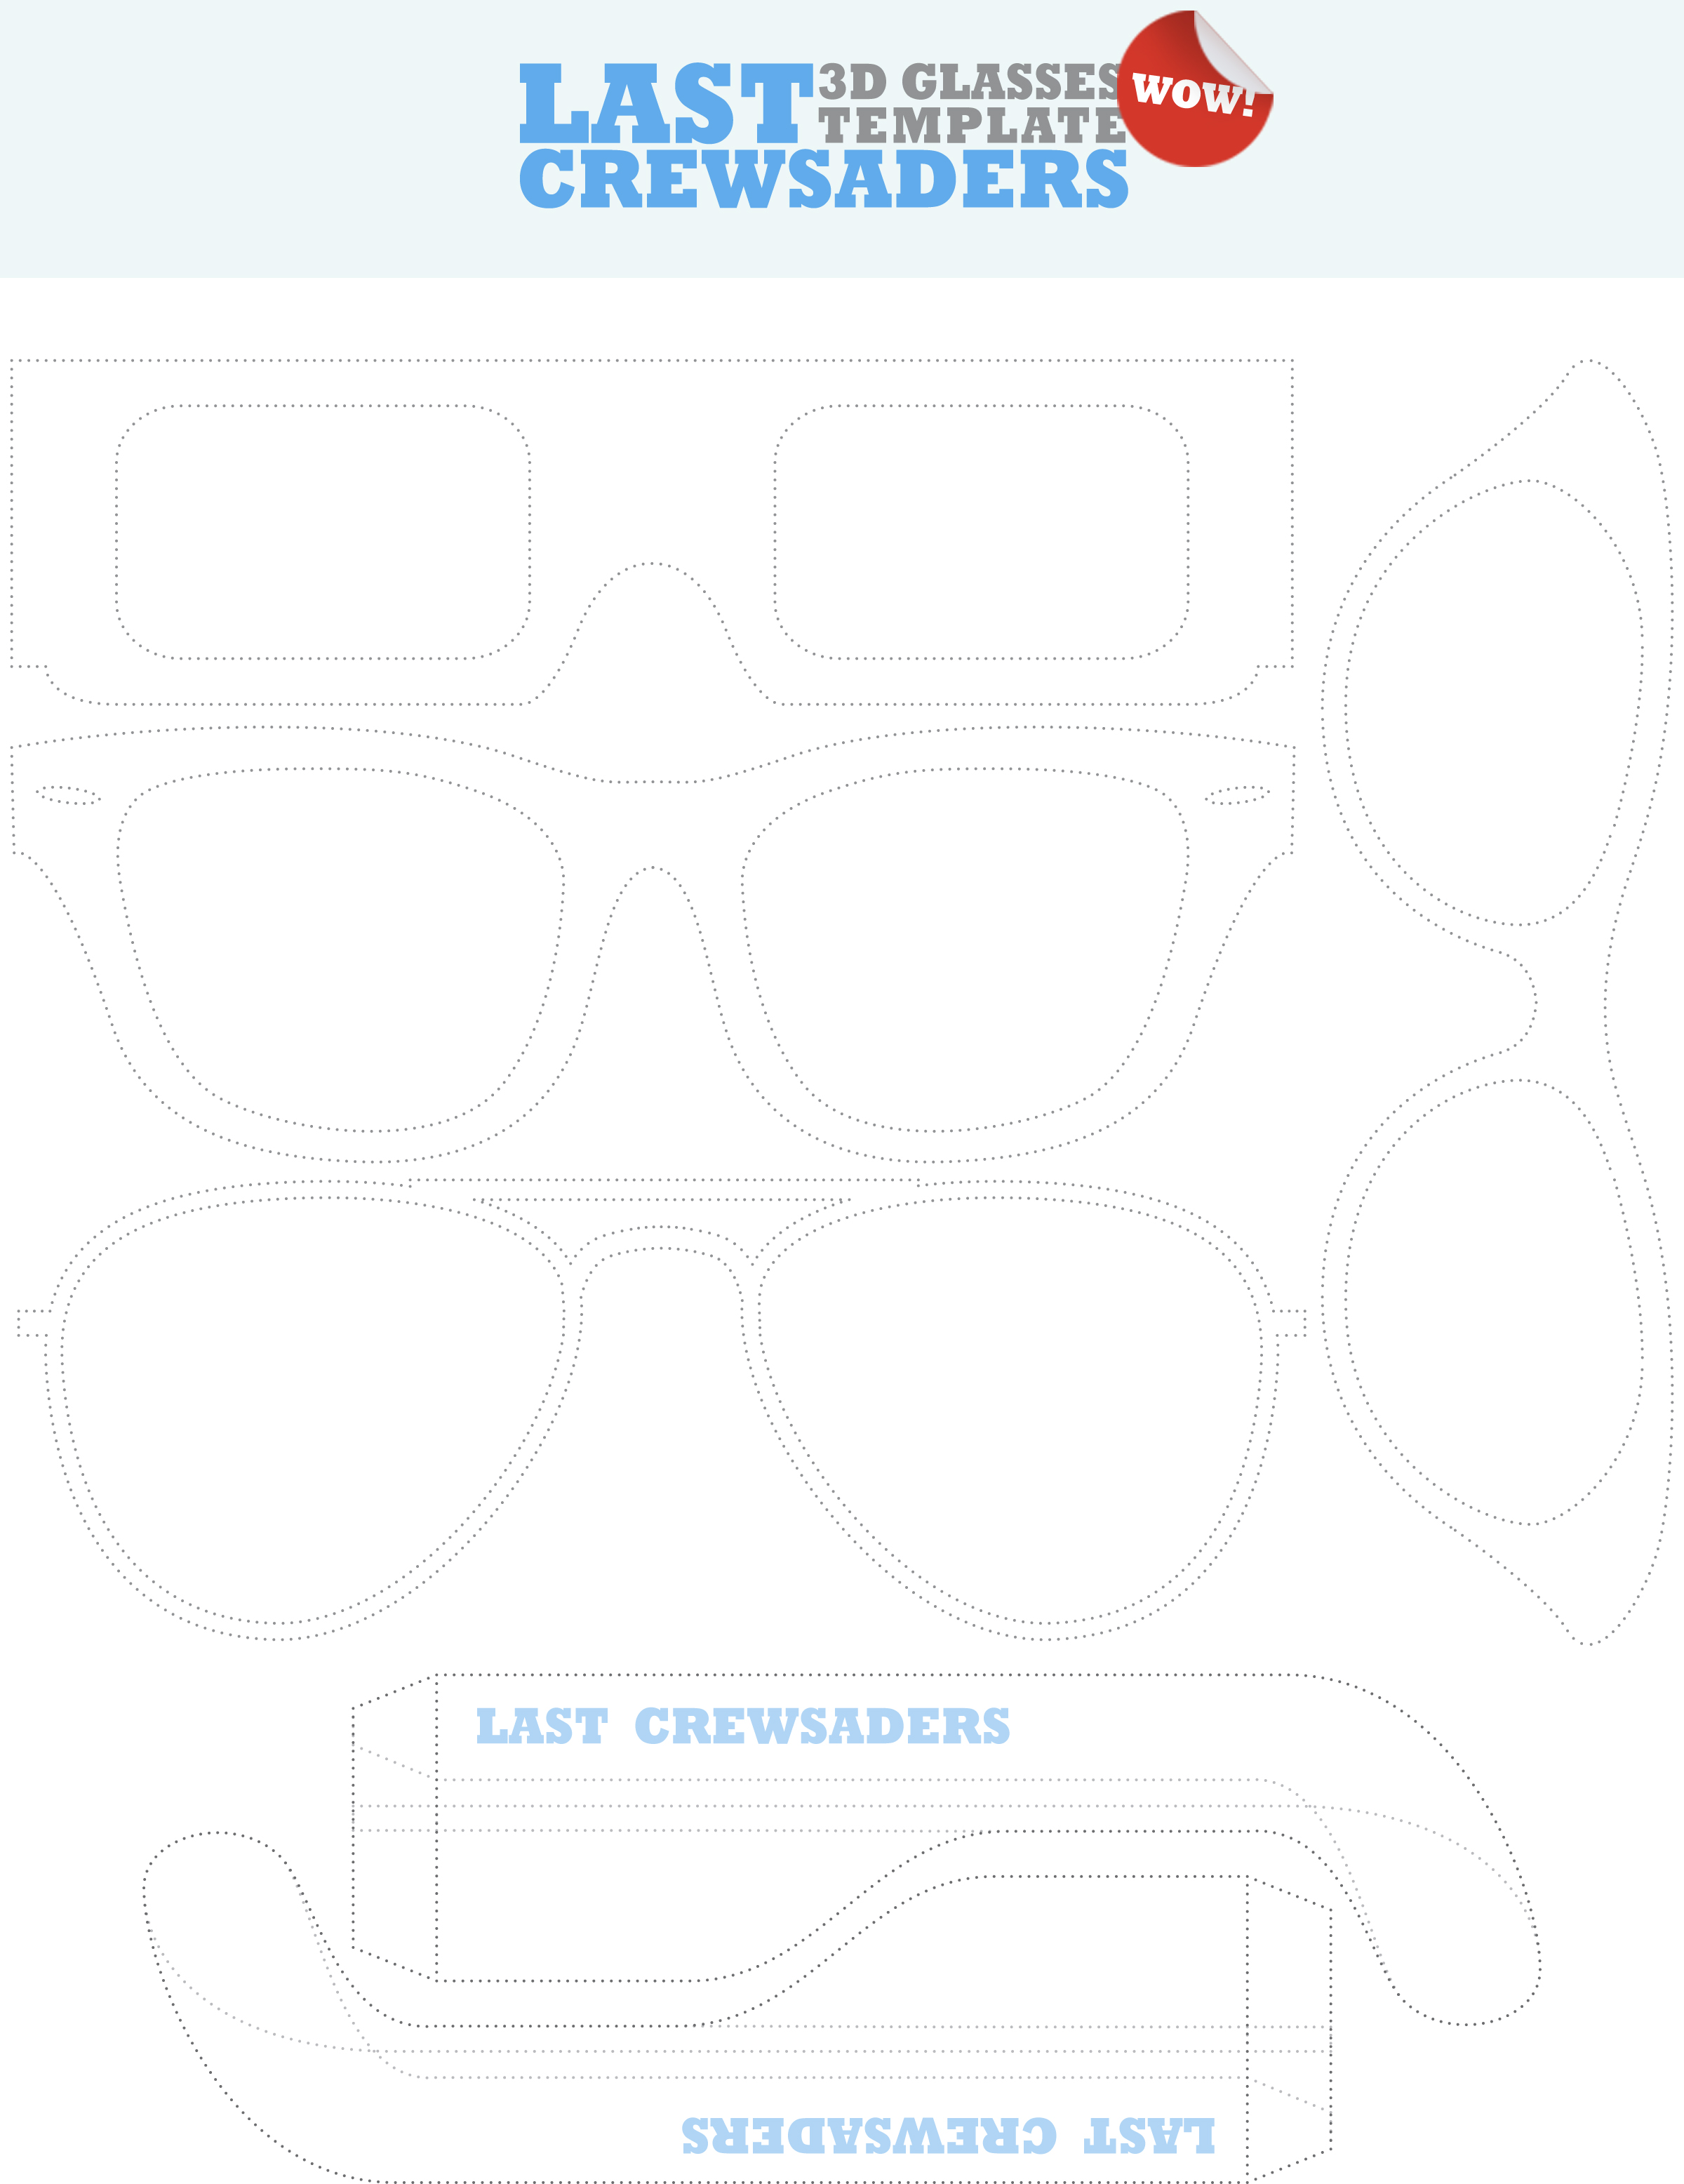 Generous 1099 Template Excel Big 1099 Template Word Regular 2014 Monthly Calendar Templates 2015 Template Calendar Youthful 3d Animator Resume Templates Yellow3d Character Modeler Resume Last Crewsaders 3D Templates